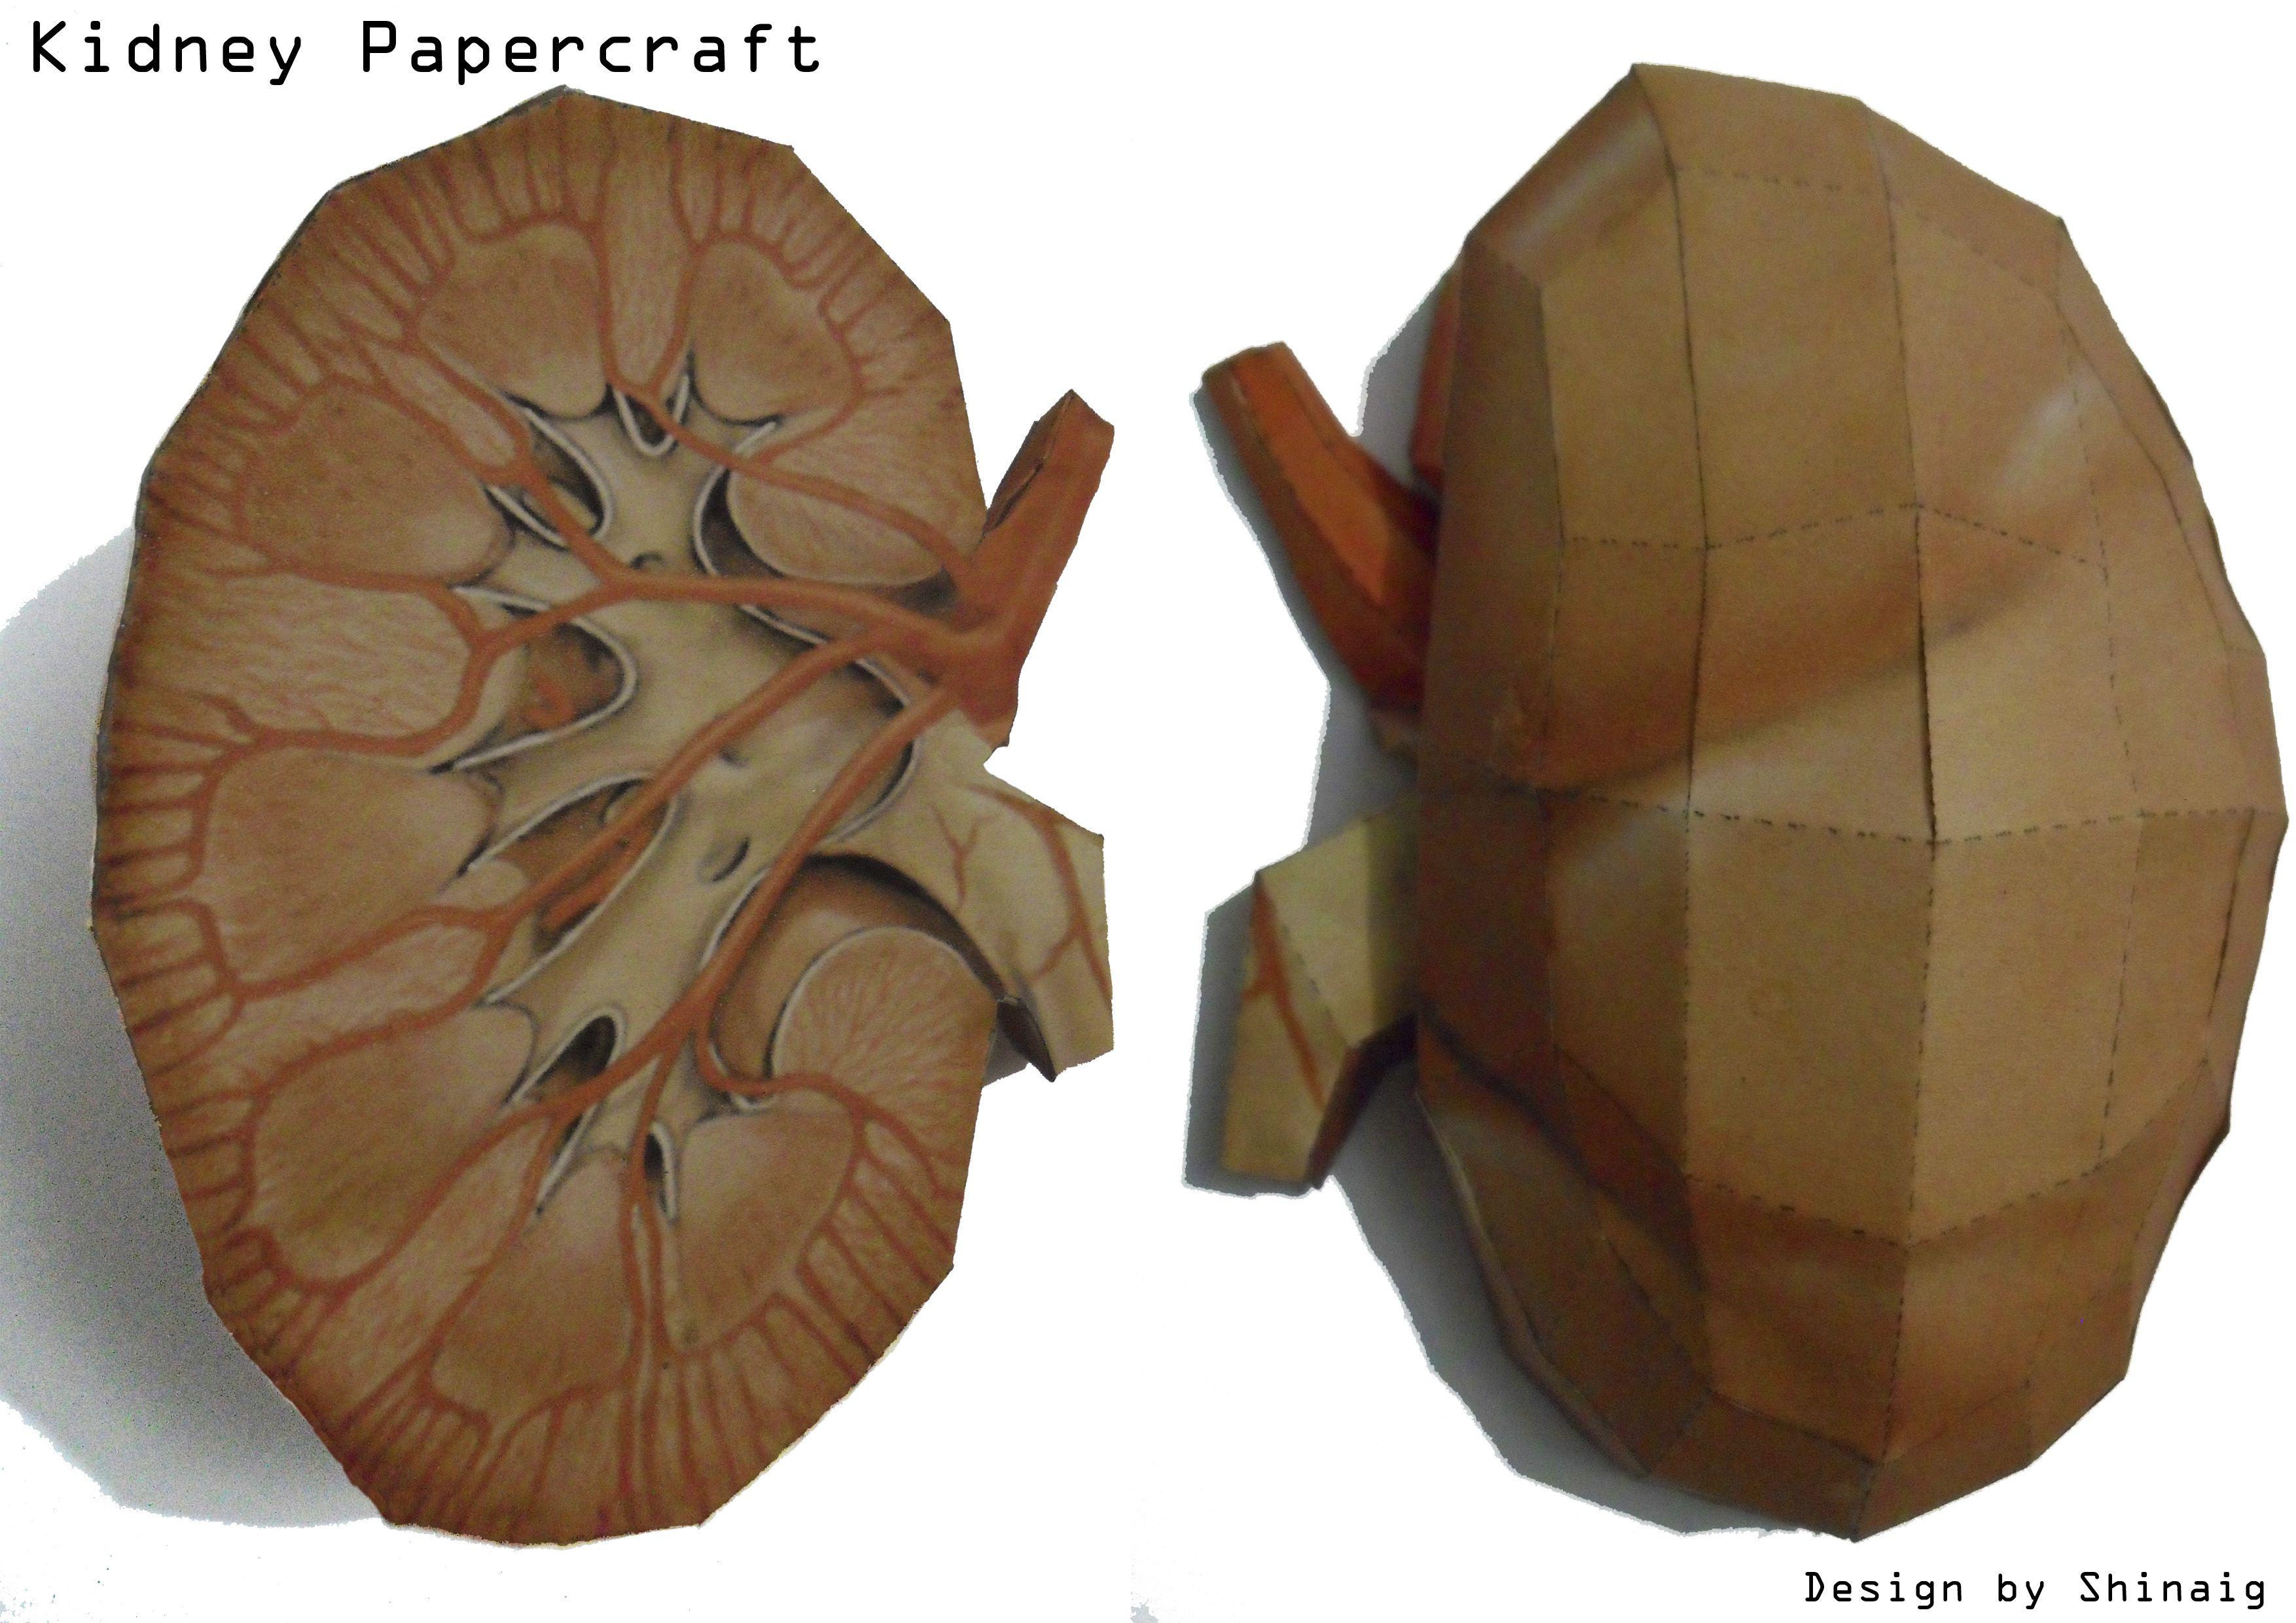 Kidney Papercraft By Shinaig D56k4gy